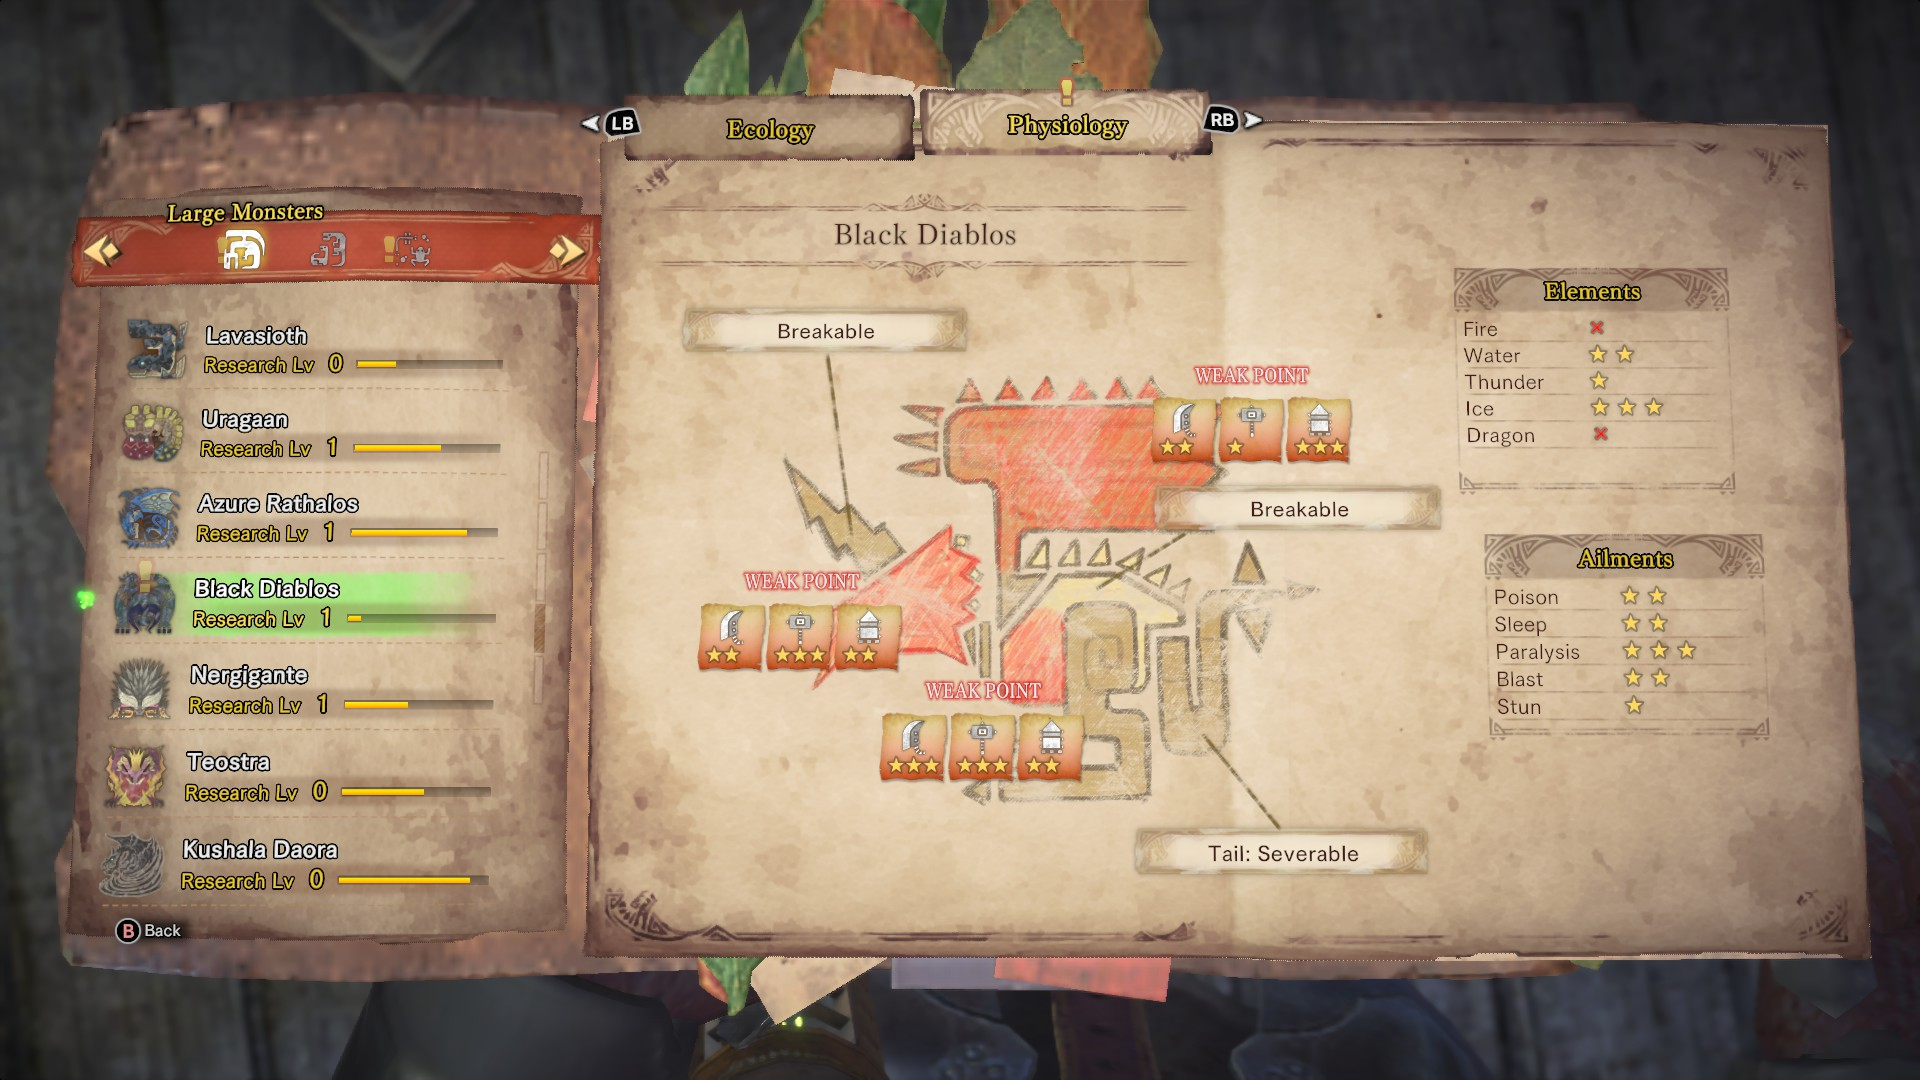 Black Diablos' entry in the monster field guide.